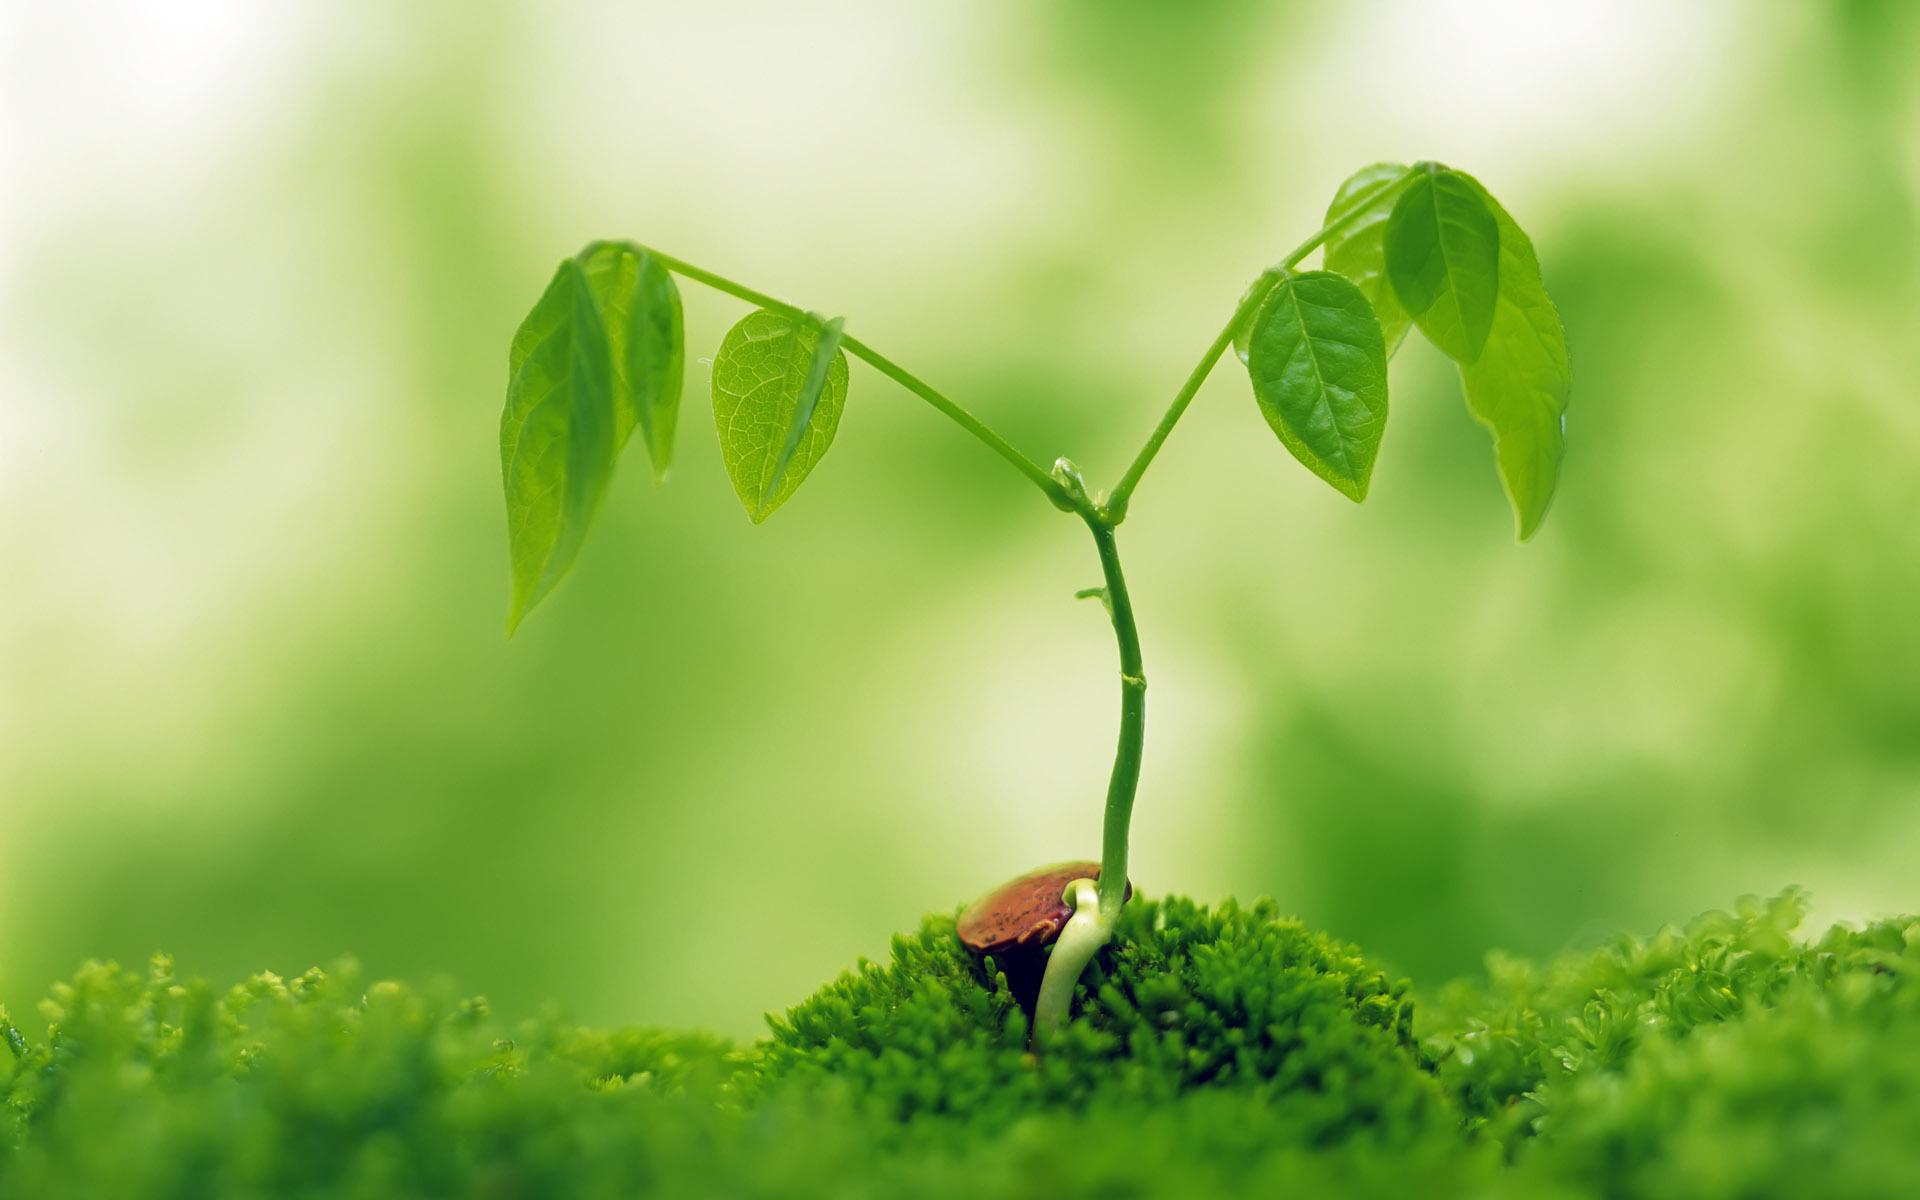 ppt 背景 壁纸 电脑桌面 发芽 绿色 绿色植物 嫩芽 嫩叶 新芽 植物 桌图片